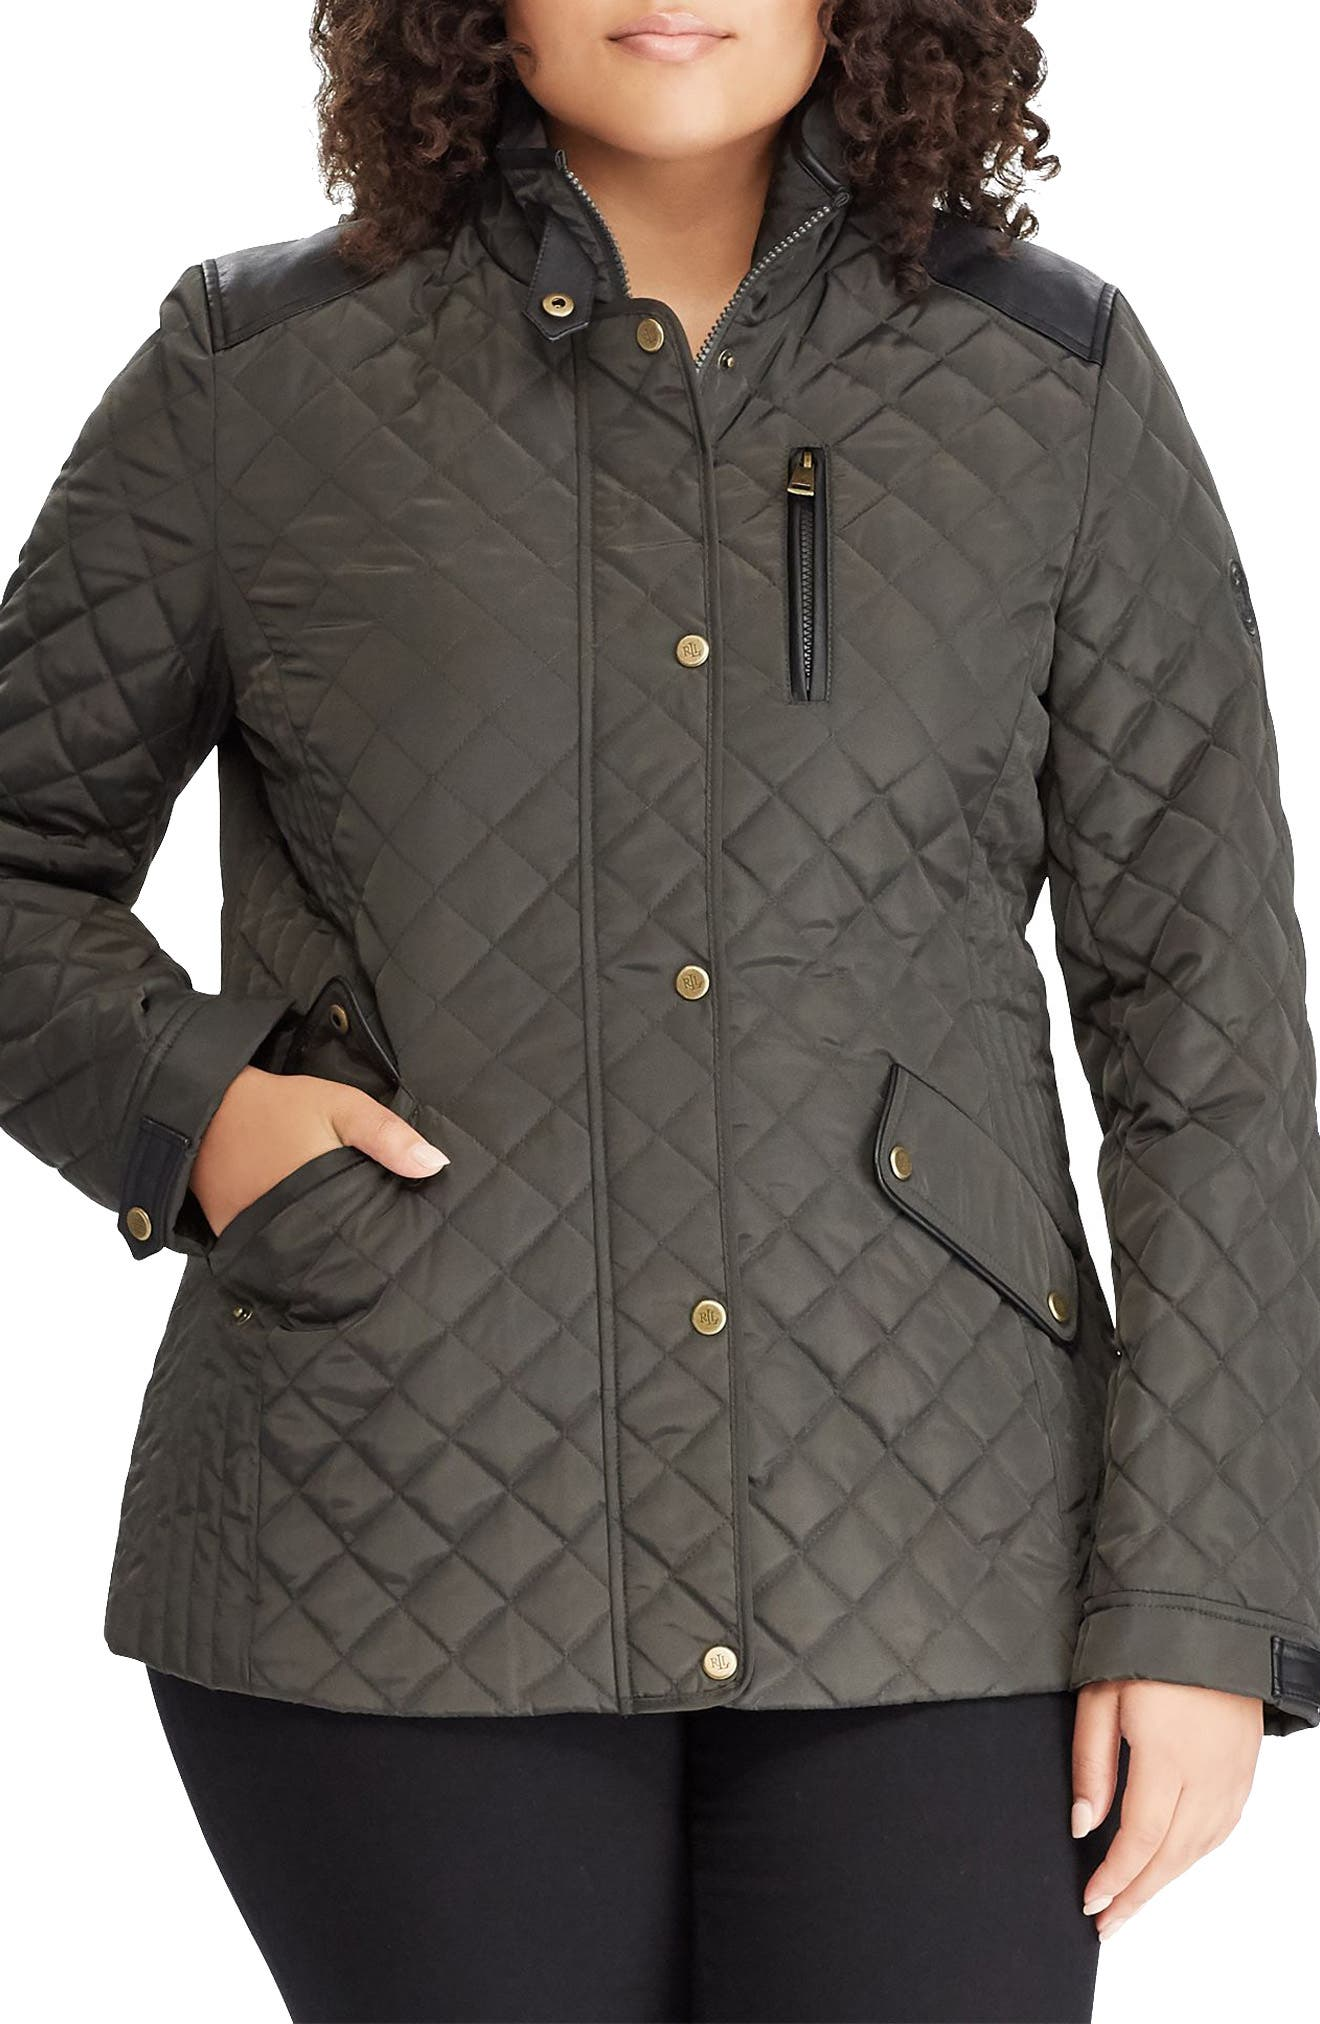 LAUREN RALPH LAUREN,                             Quilted Jacket with Faux Leather Trim,                             Main thumbnail 1, color,                             300